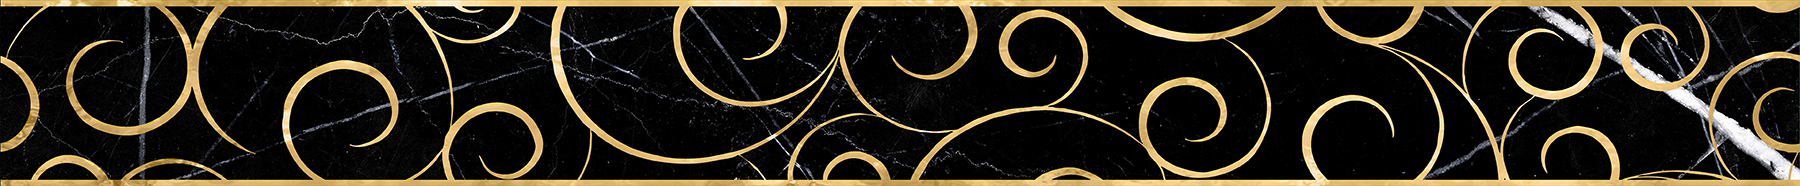 Миланезе дизайн Бордюр Флорал неро 1506-0160 6х60 бордюр настенный 6х60 3 миланезе дизайн флорал крема